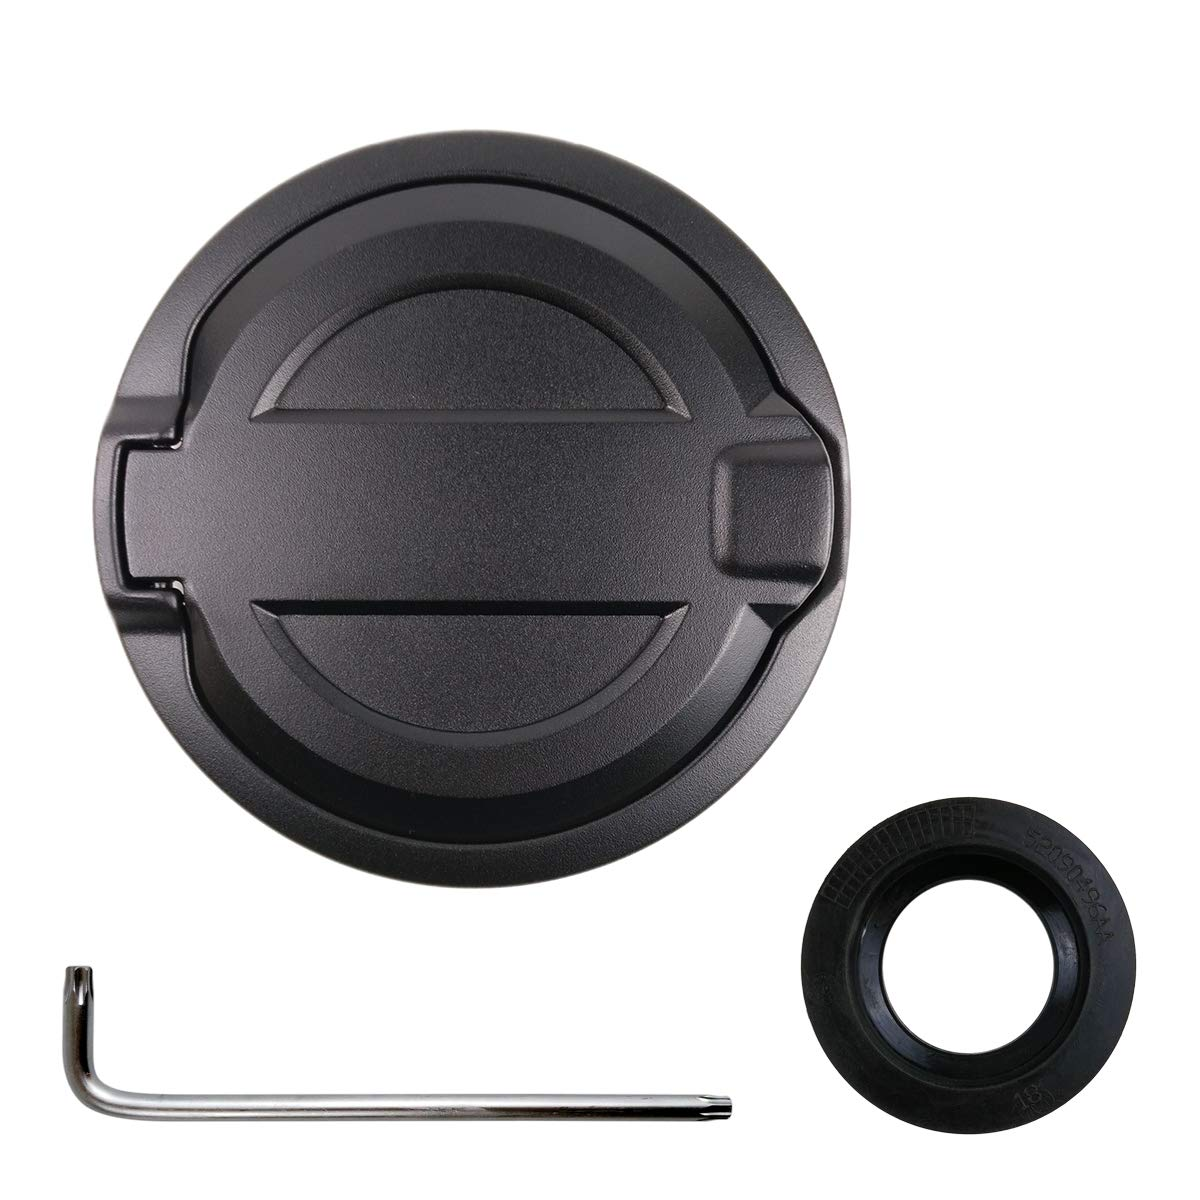 Gas Cap Cover for 2018 Jeep Wrangler JL & Unlimited 4-Door 2-Door Gas Tank Cap (come with Rubber Ring, Installation Tool) XBEEK